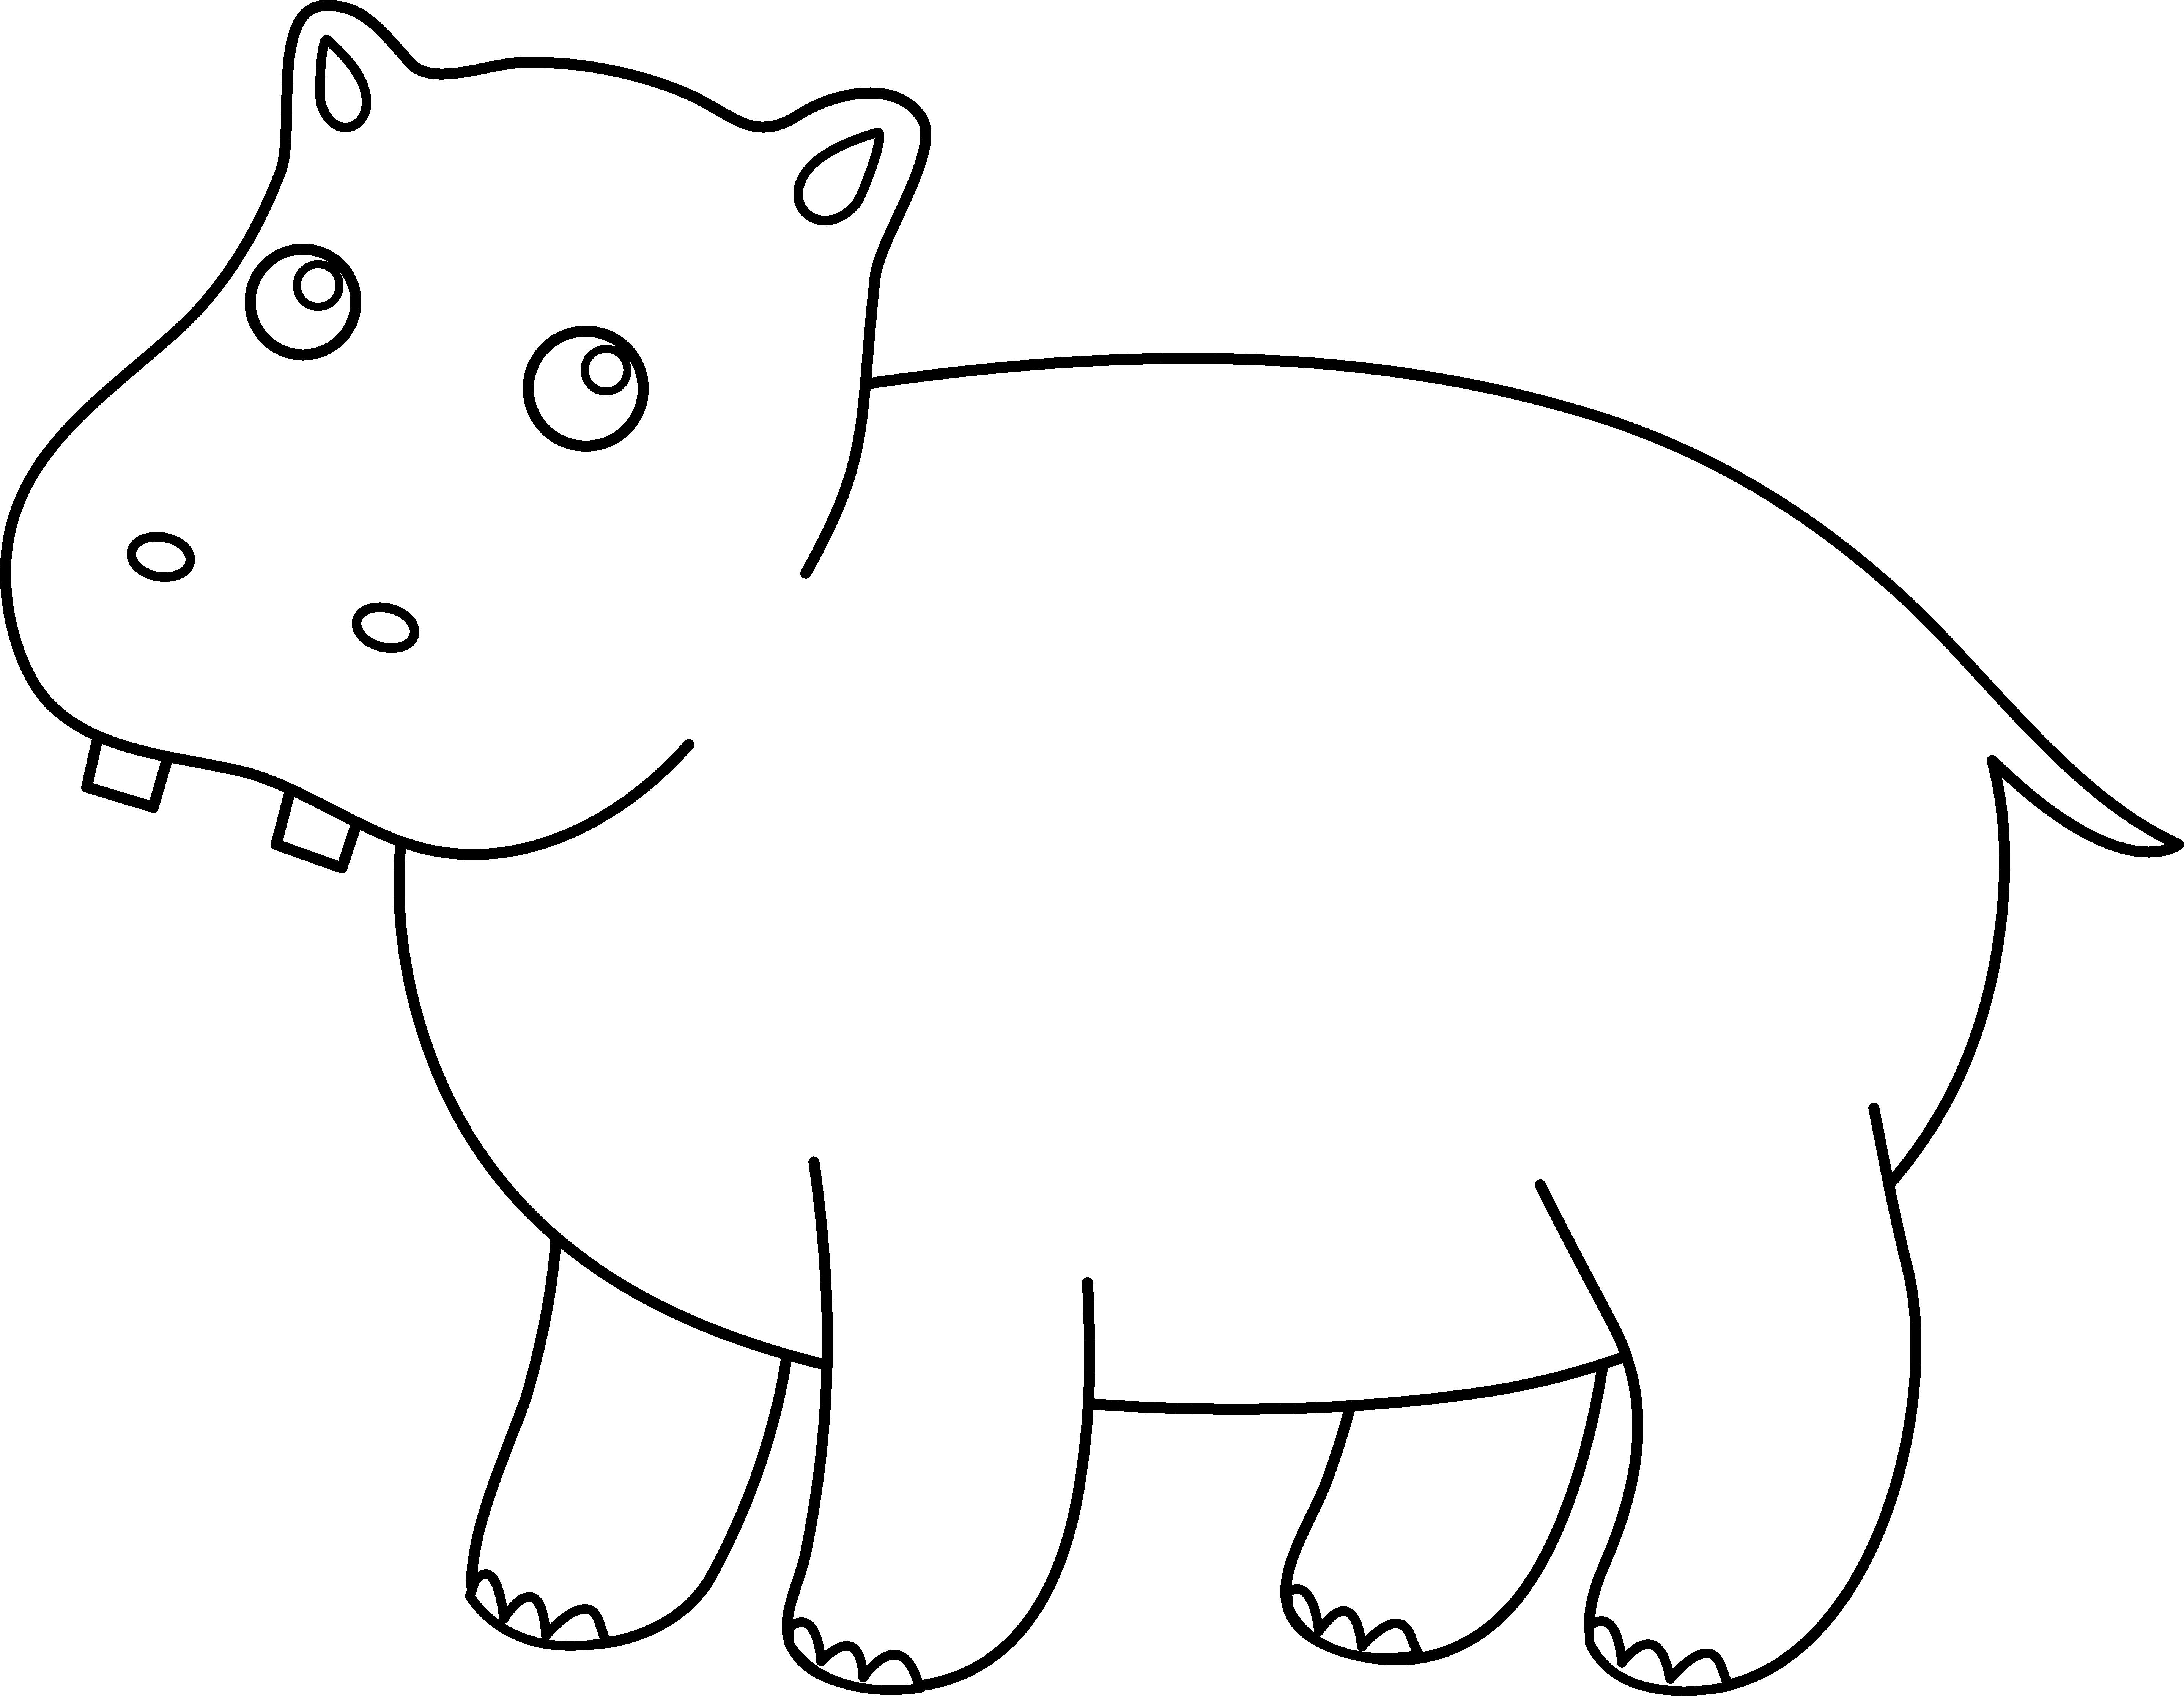 Clipart hippo svg. Scal pinterest